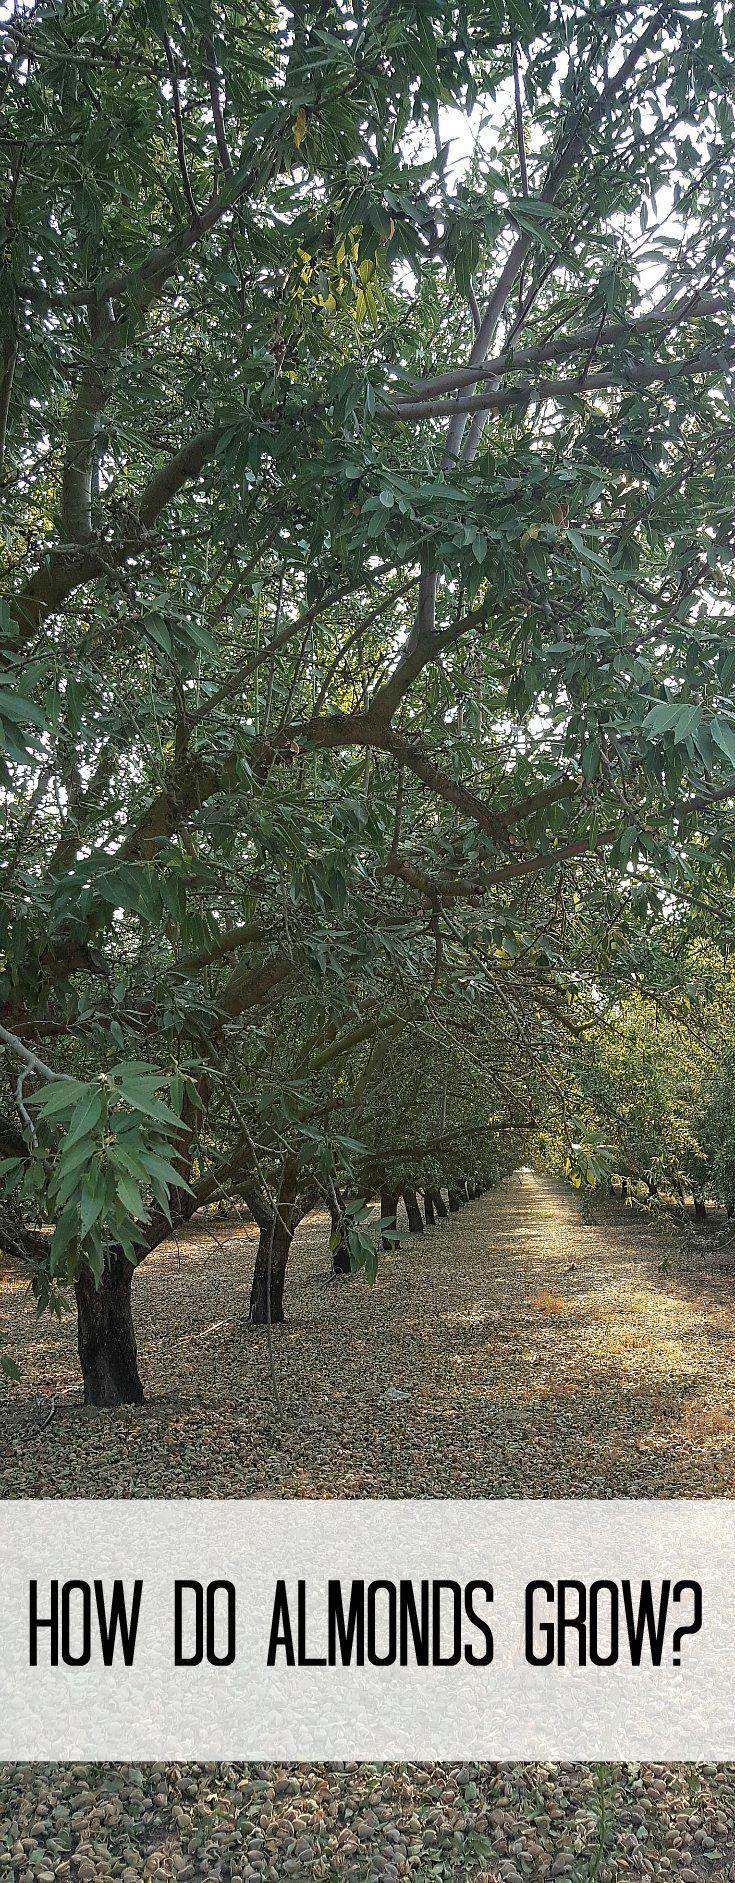 How do almonds grow? California Almond Farm Tour and 15 Delicious Almond Recipes Ad